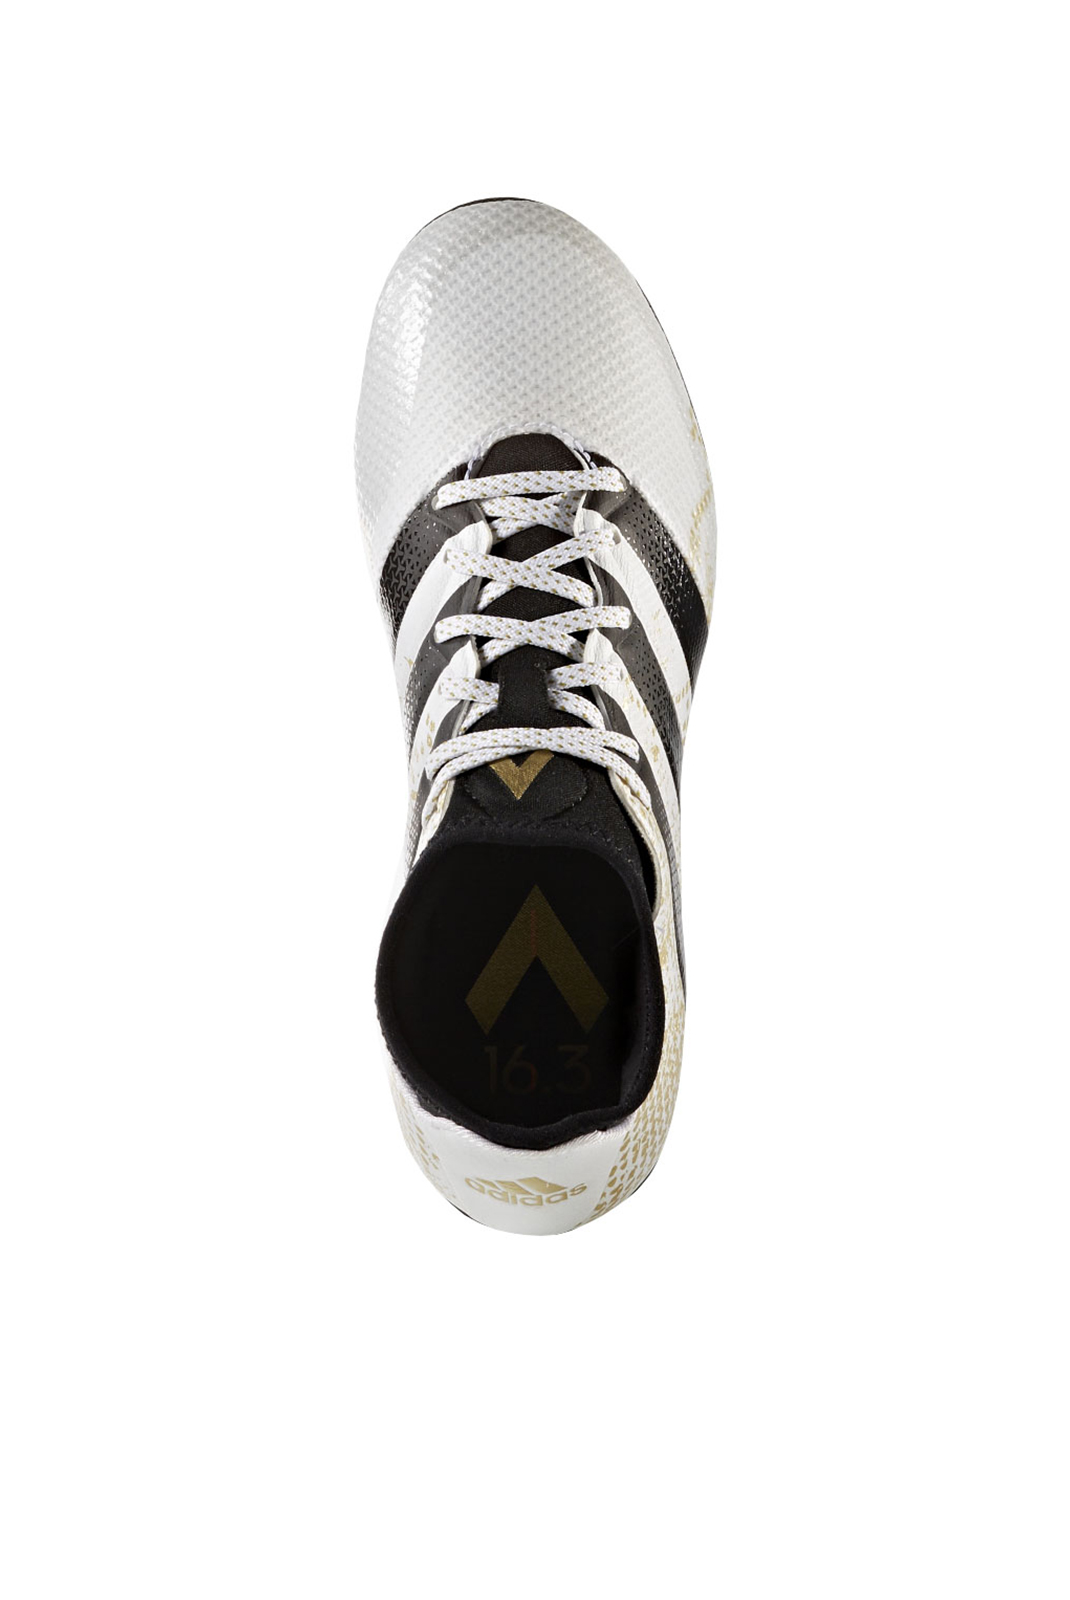 Baskets / Sport  Adidas AQ3437 ACE 16.3 PRIMEMESH TF J BLACK WHITE